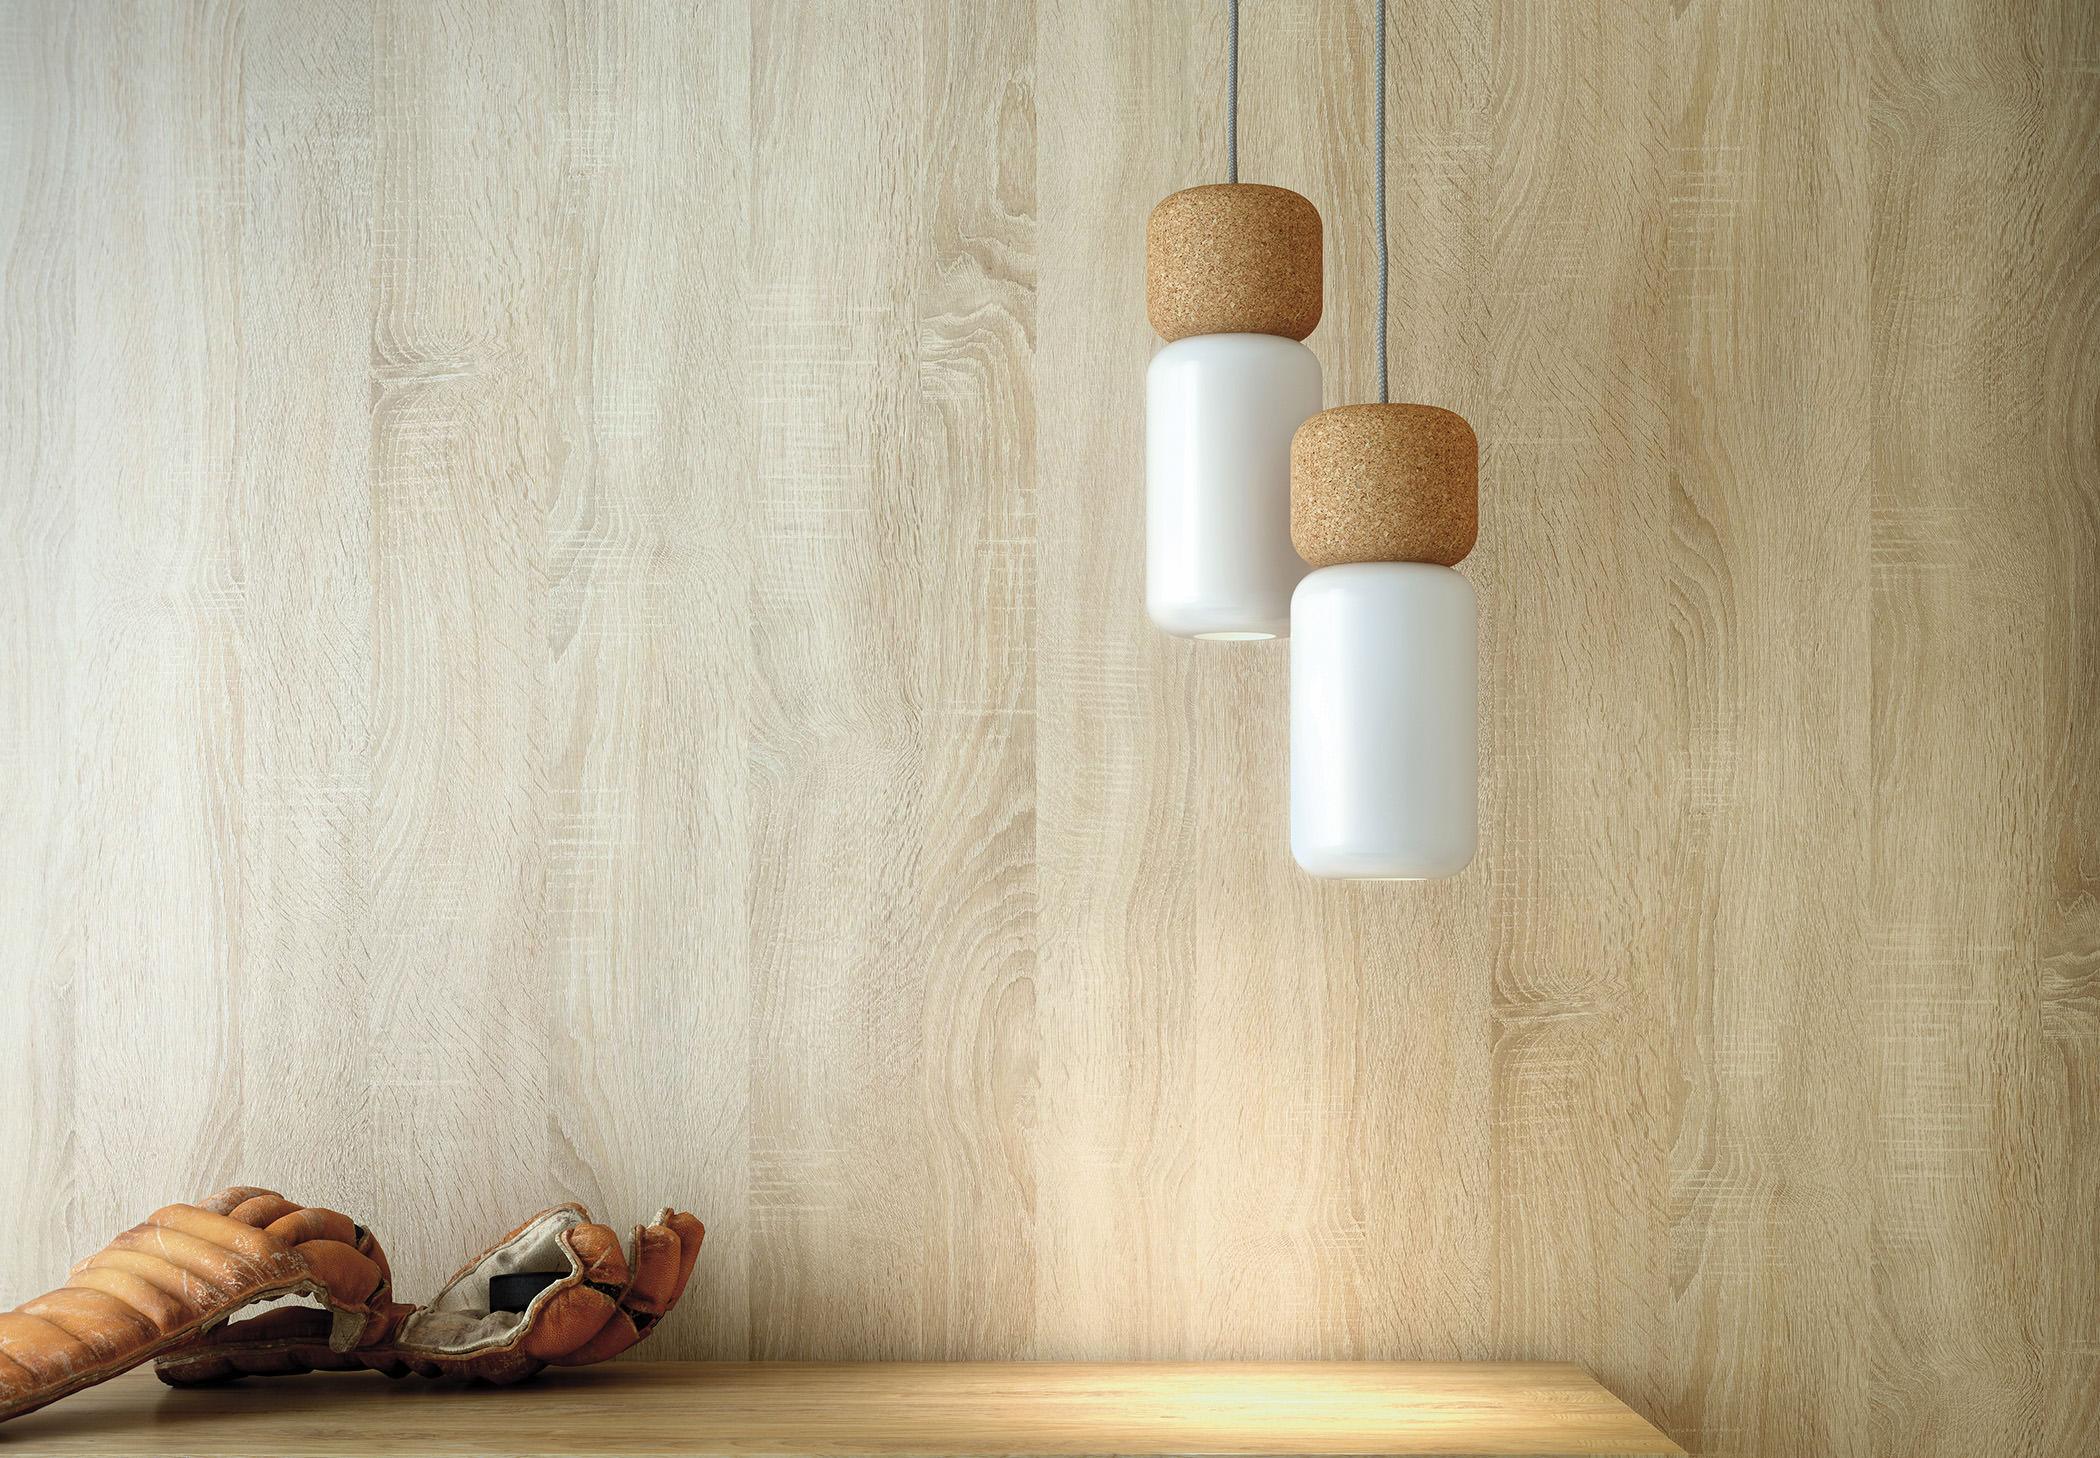 Pila T 3555 Suspension Lamp Estiluz  Image Ambient 01